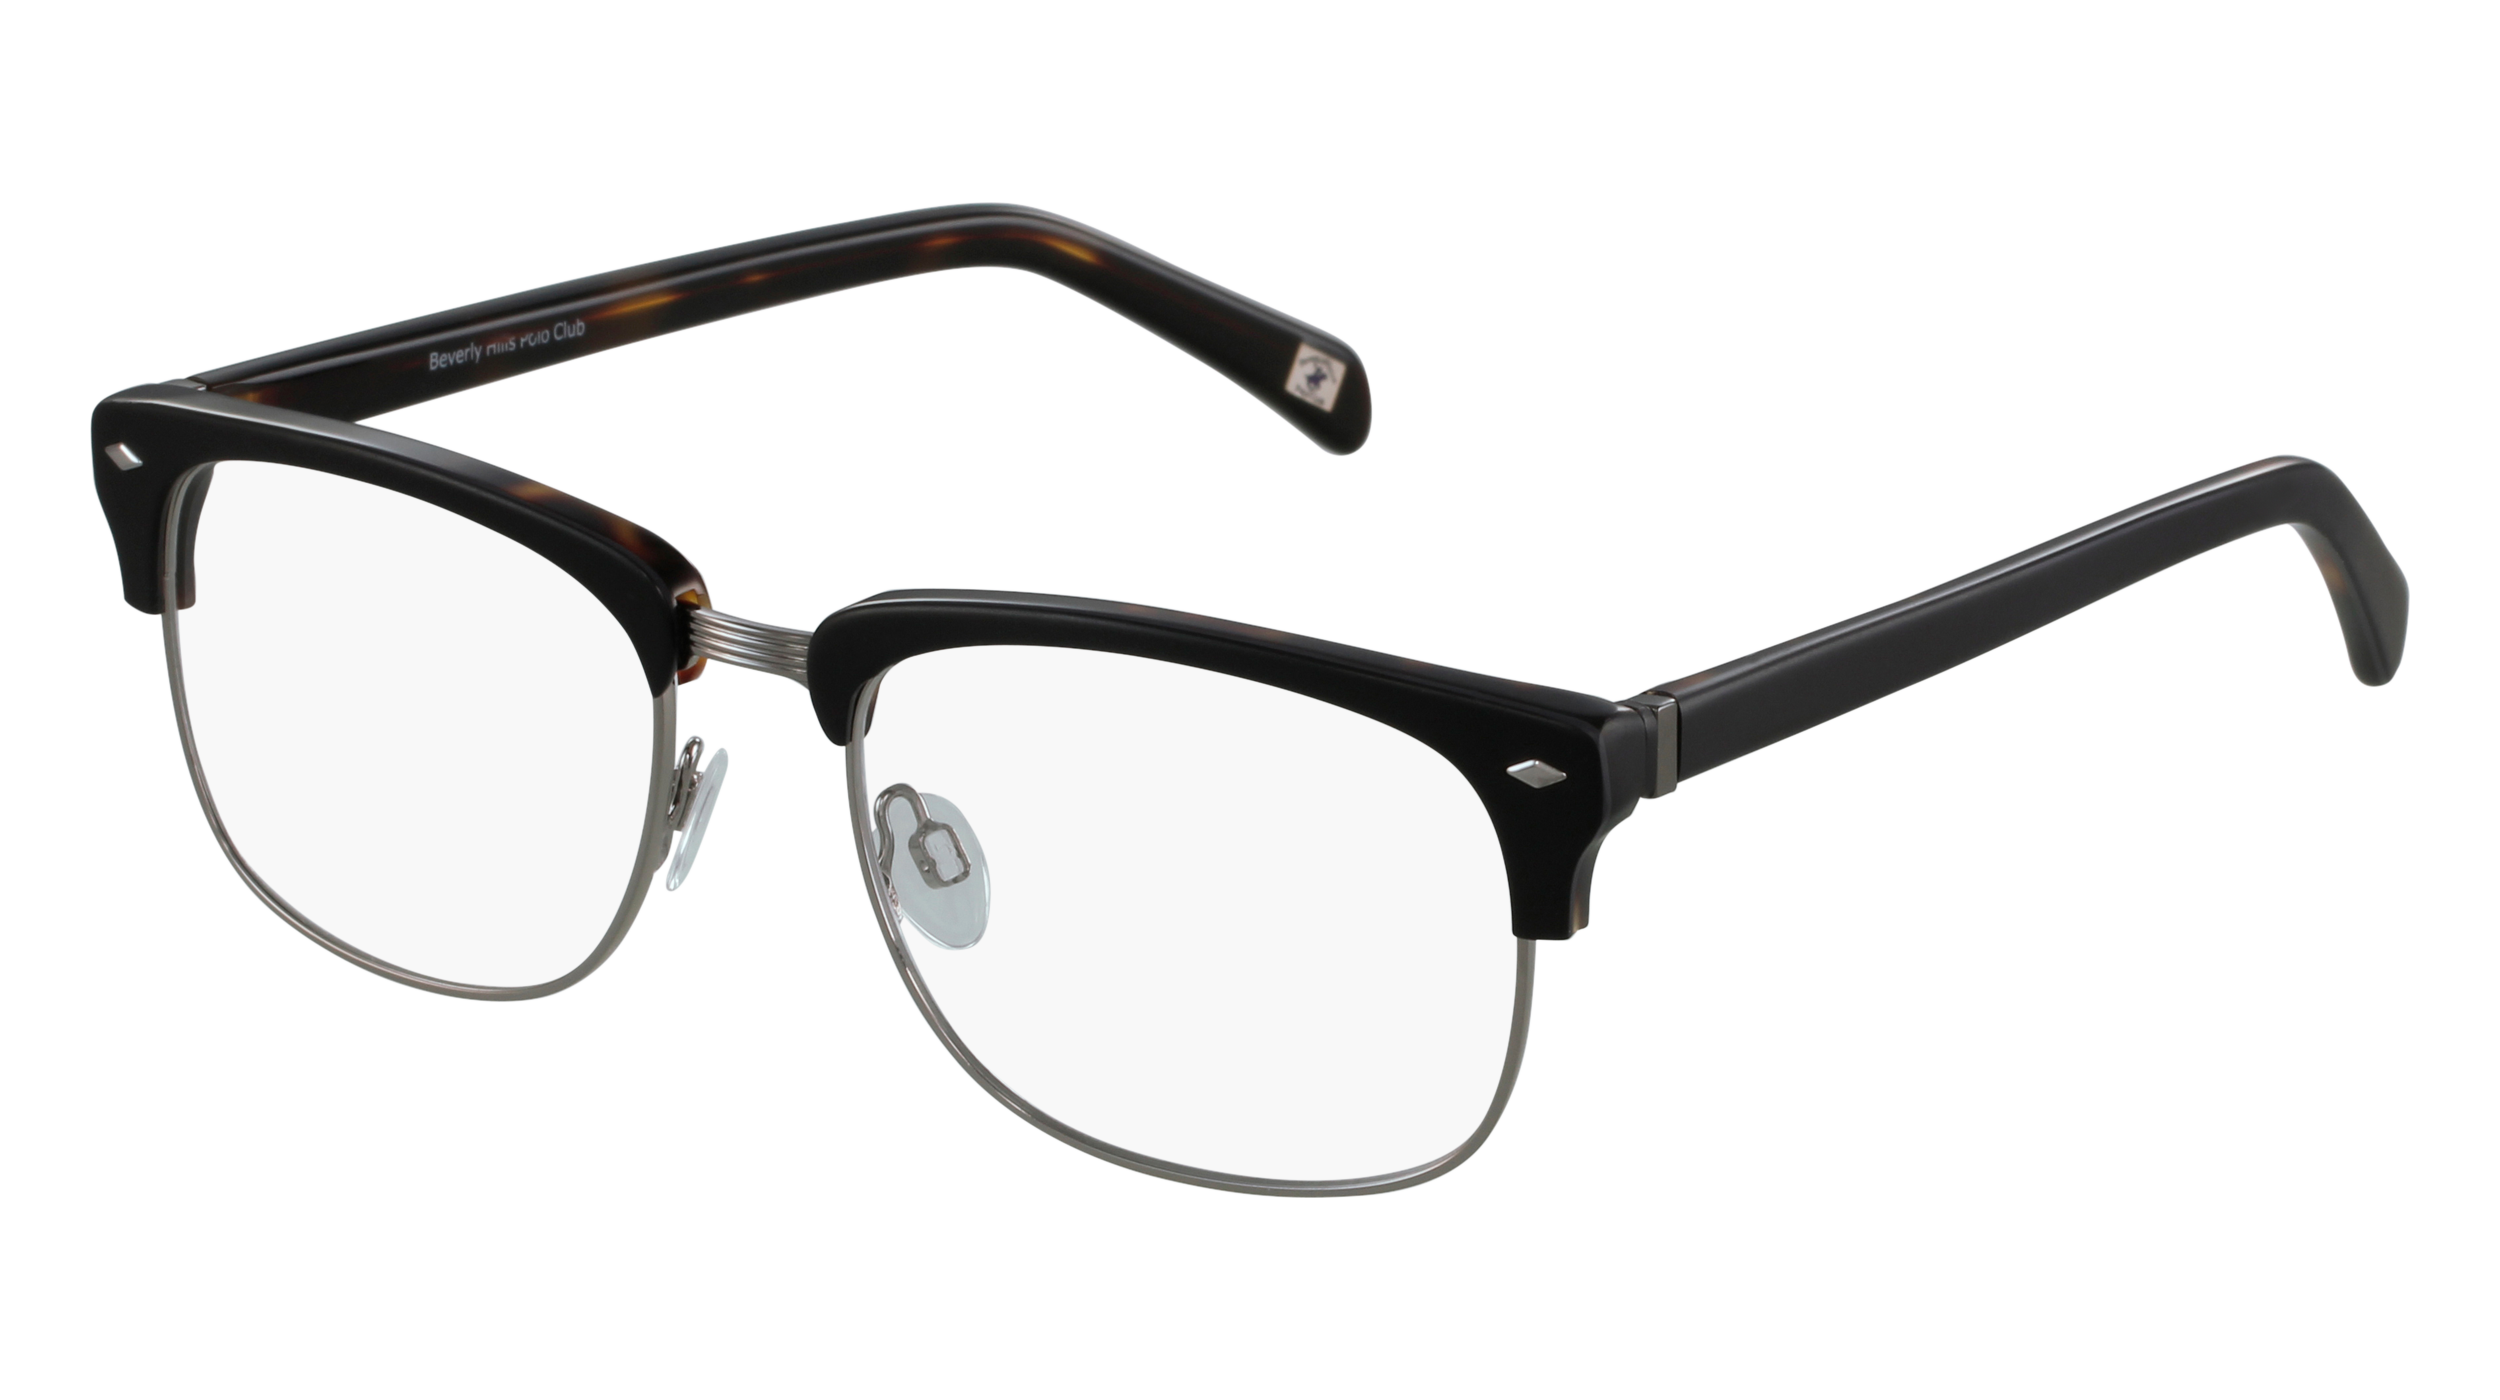 Glasses, Sunglasses, & Eye Exams - JCPenney Optical ...